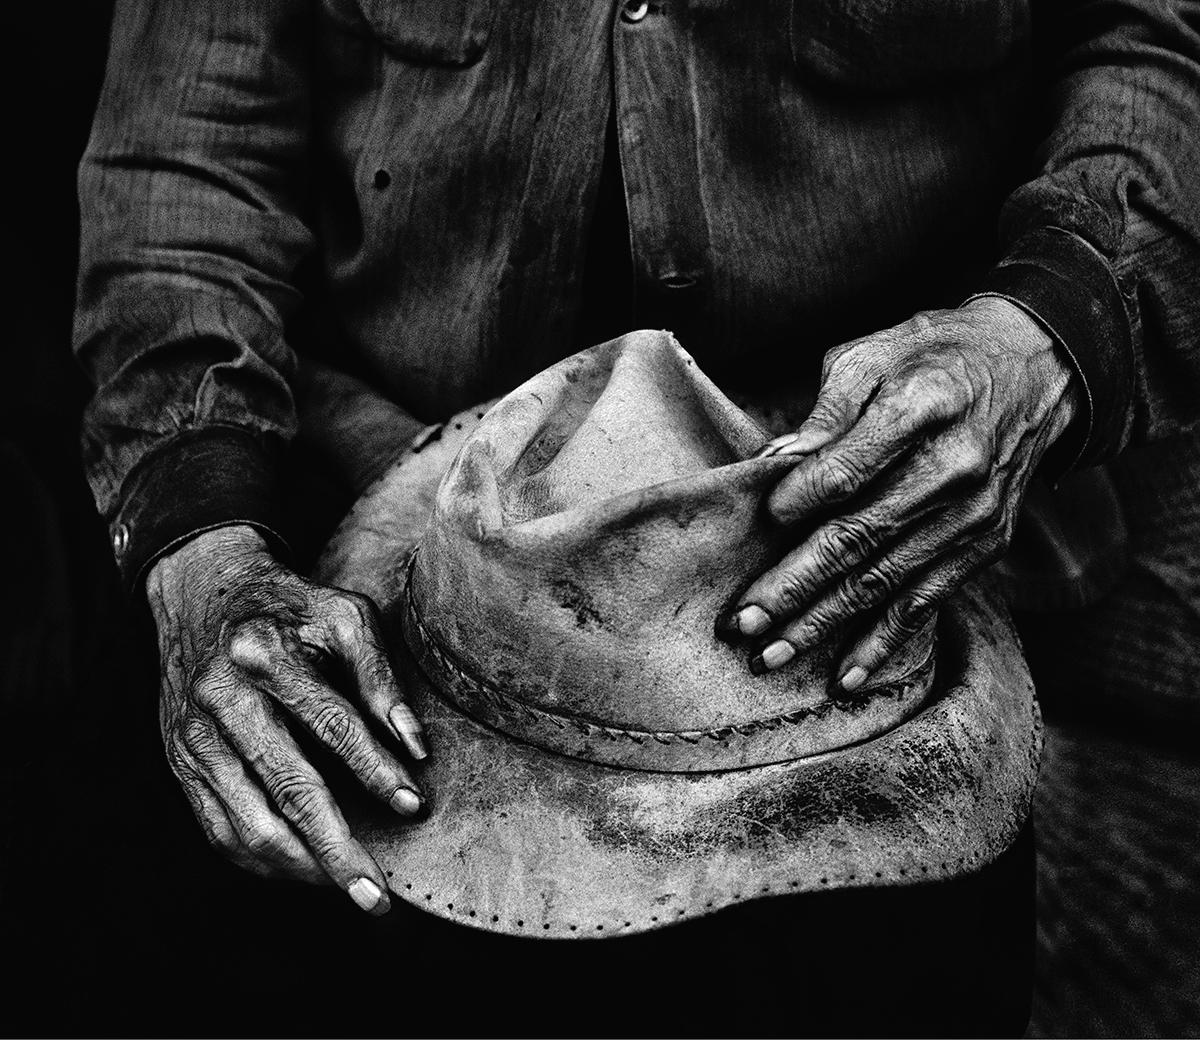 Cheng's Hands, 1966